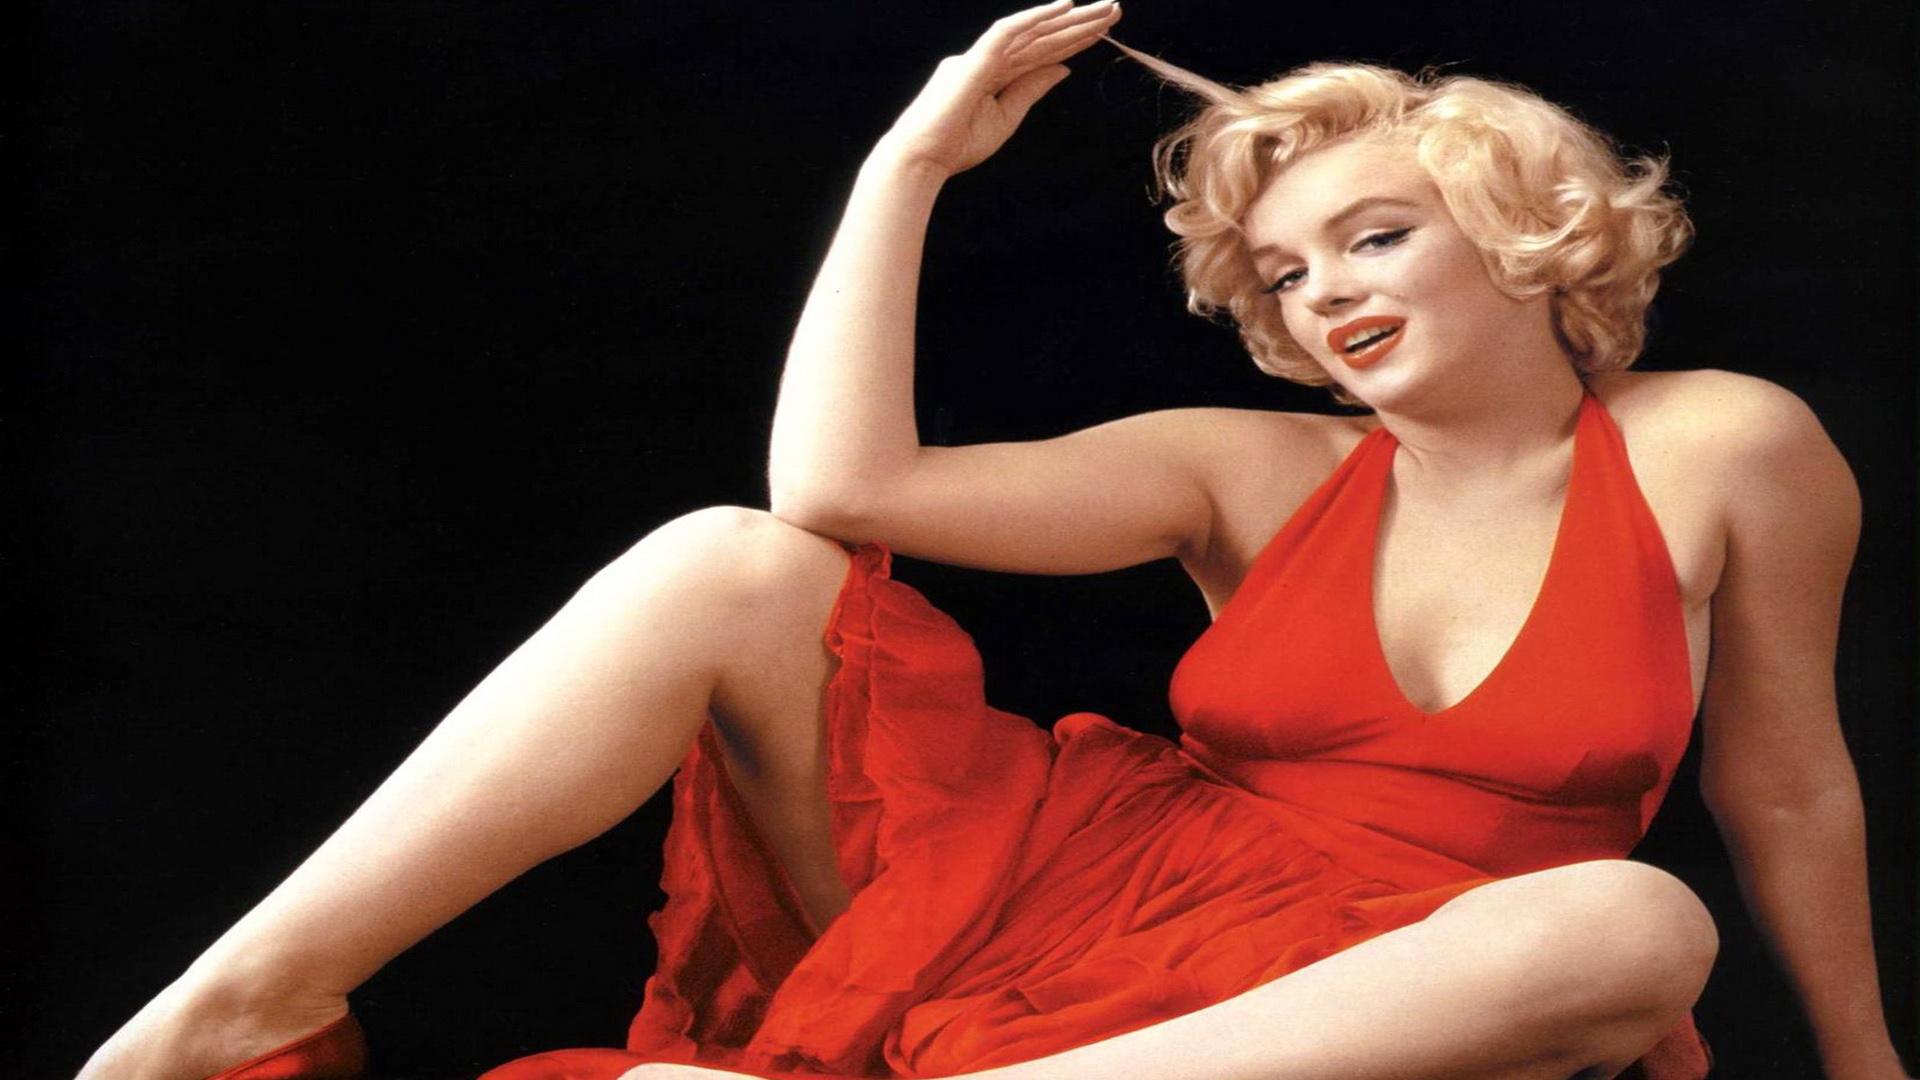 [41+] Marilyn Monroe with Guns Wallpaper on WallpaperSafari